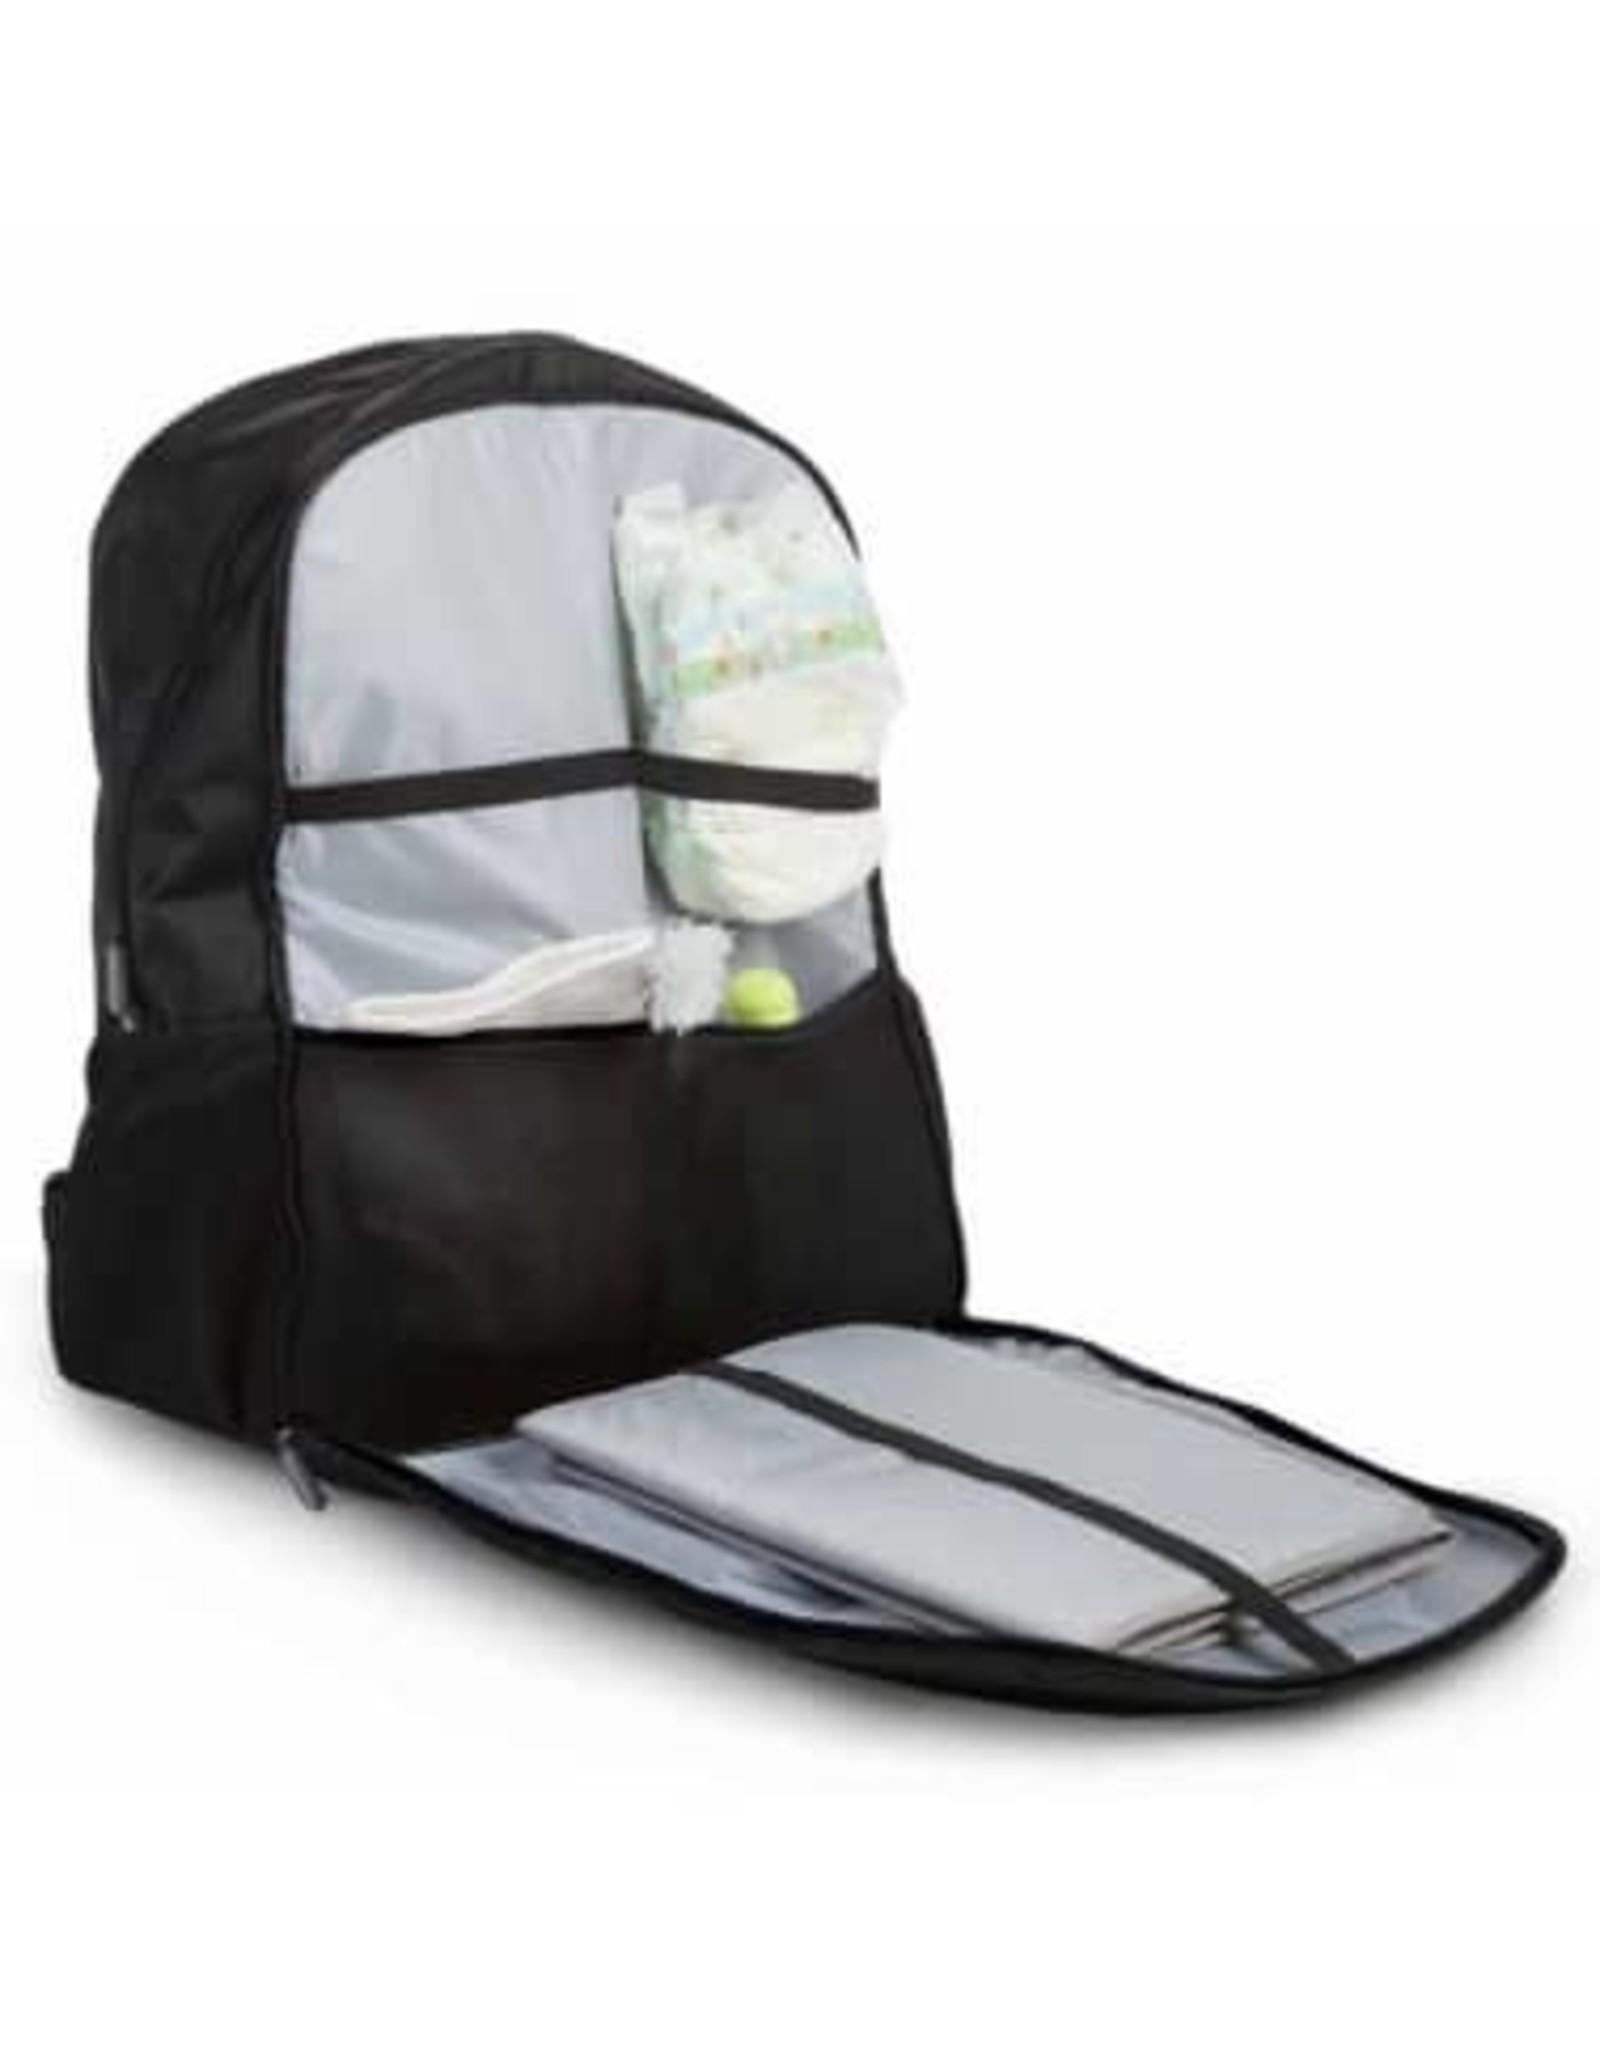 Childhome Childhome Daddy Bag Verzorgingsrugzak - Zwart